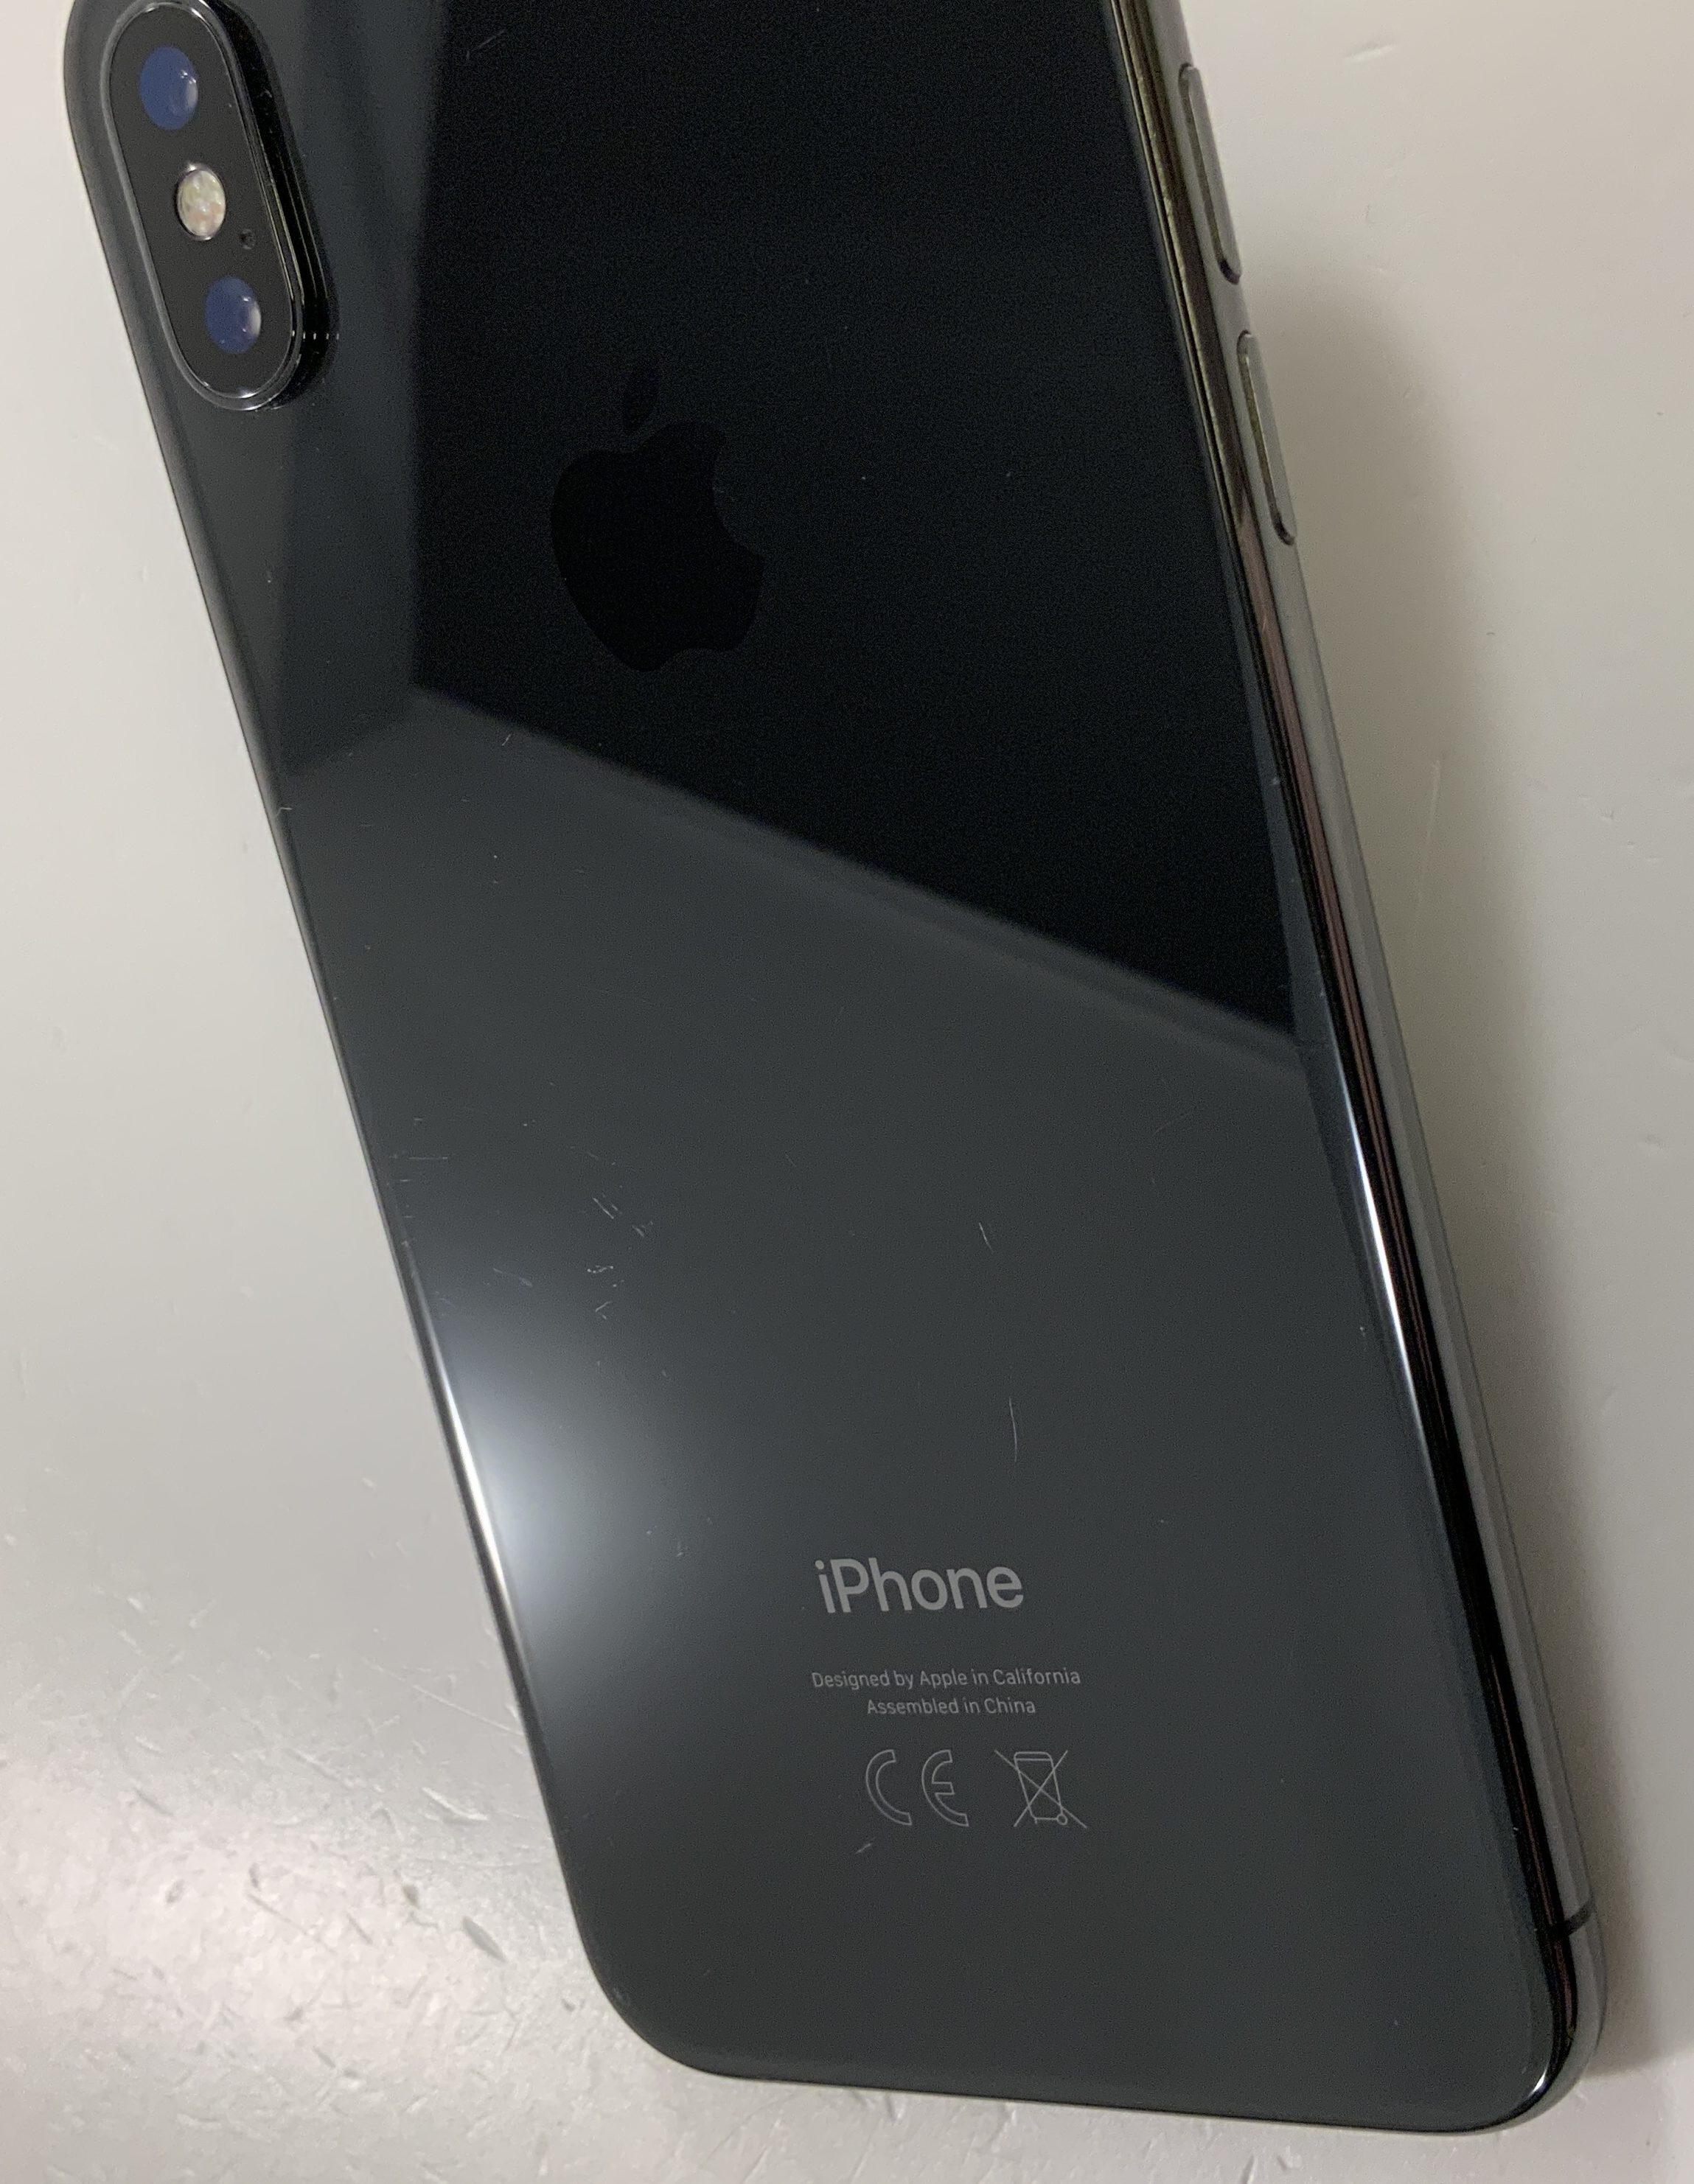 iPhone X 64GB, 64GB, Space Gray, image 3